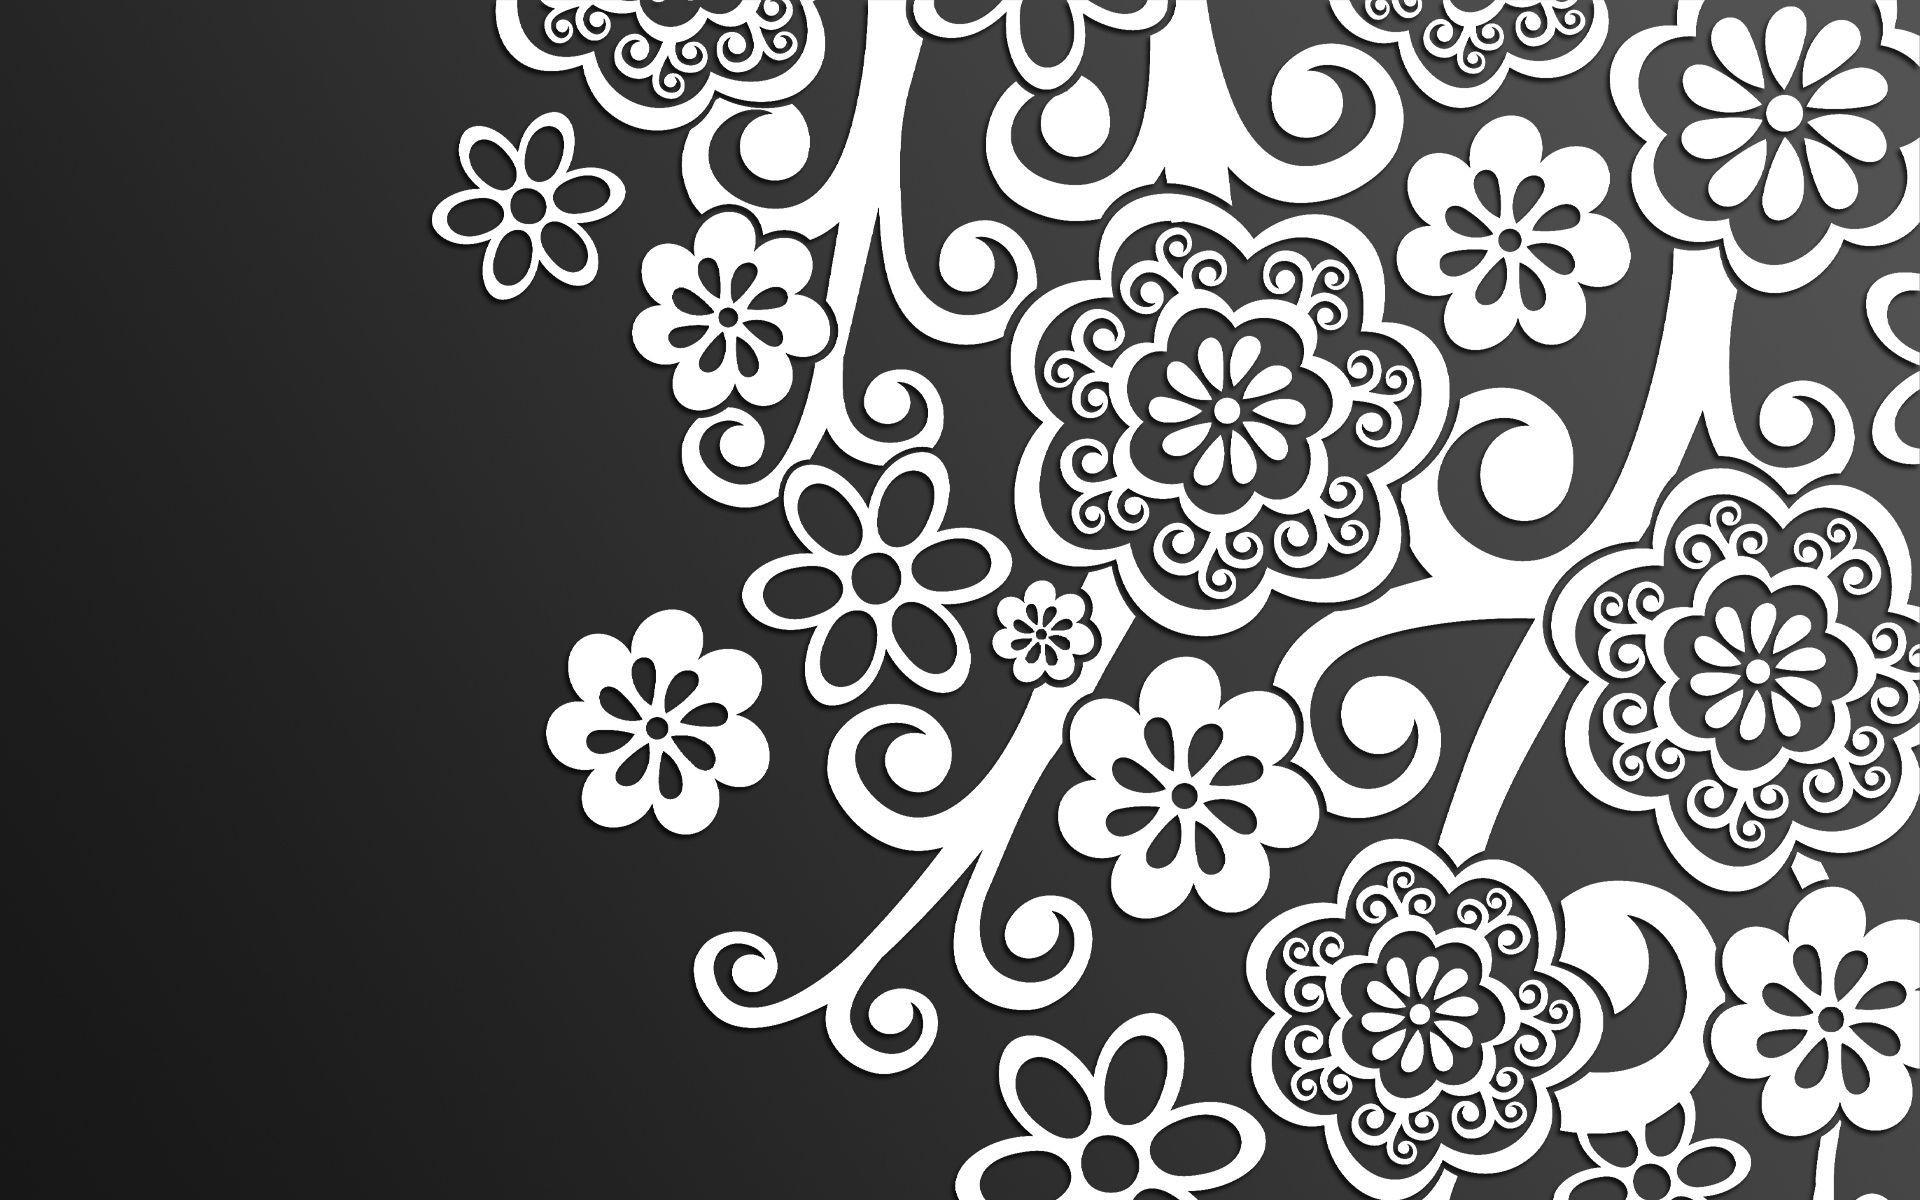 floral pattern hd wallpaper batik vector background hd 1594704 hd wallpaper backgrounds download floral pattern hd wallpaper batik